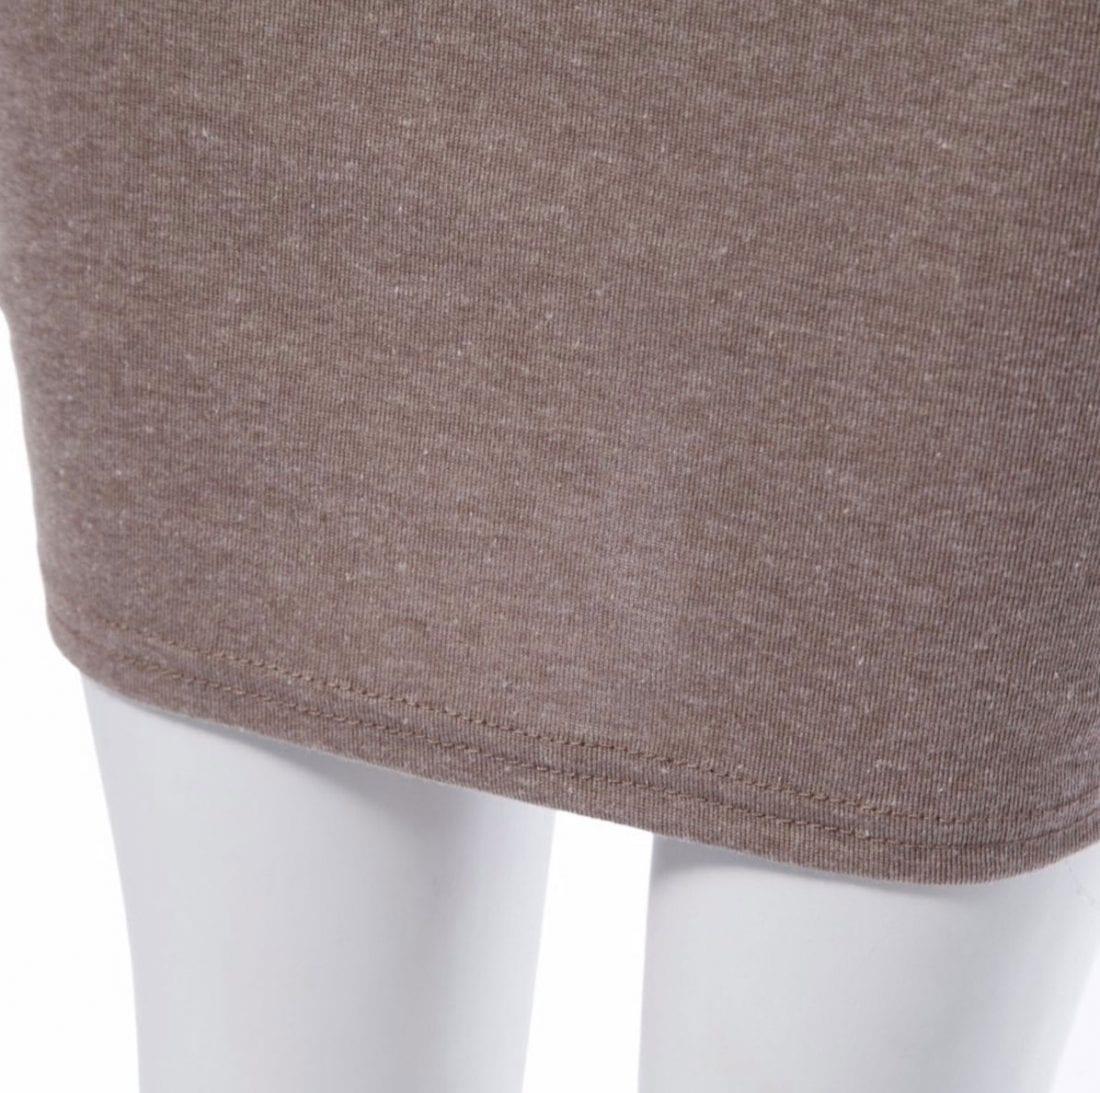 M0183 gray7 Long Sleeve Dresses maureens.com boutique